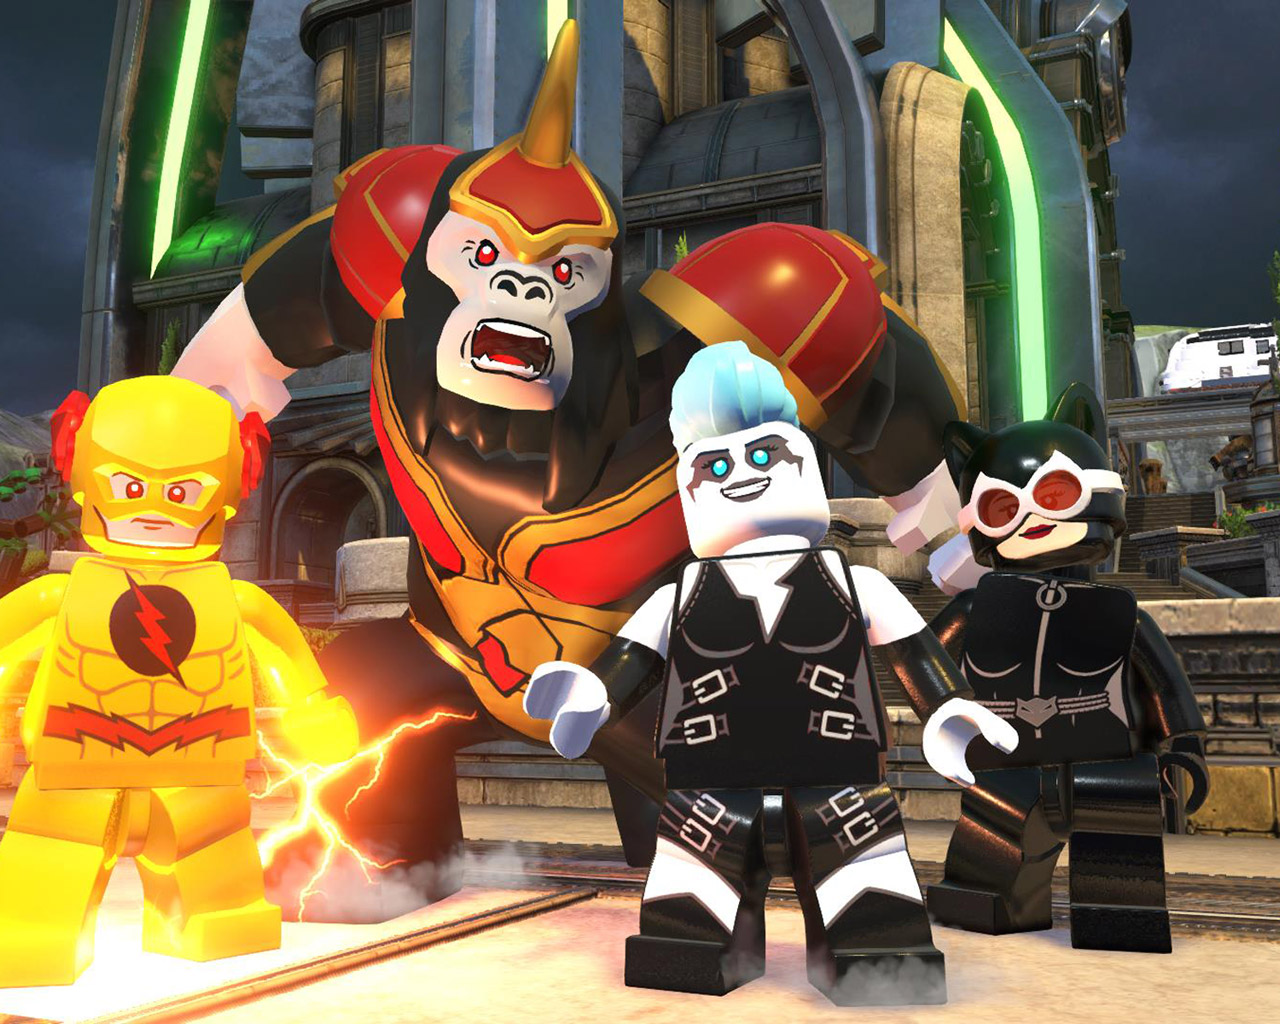 Free Lego DC Super Villains Wallpaper in 1280x1024